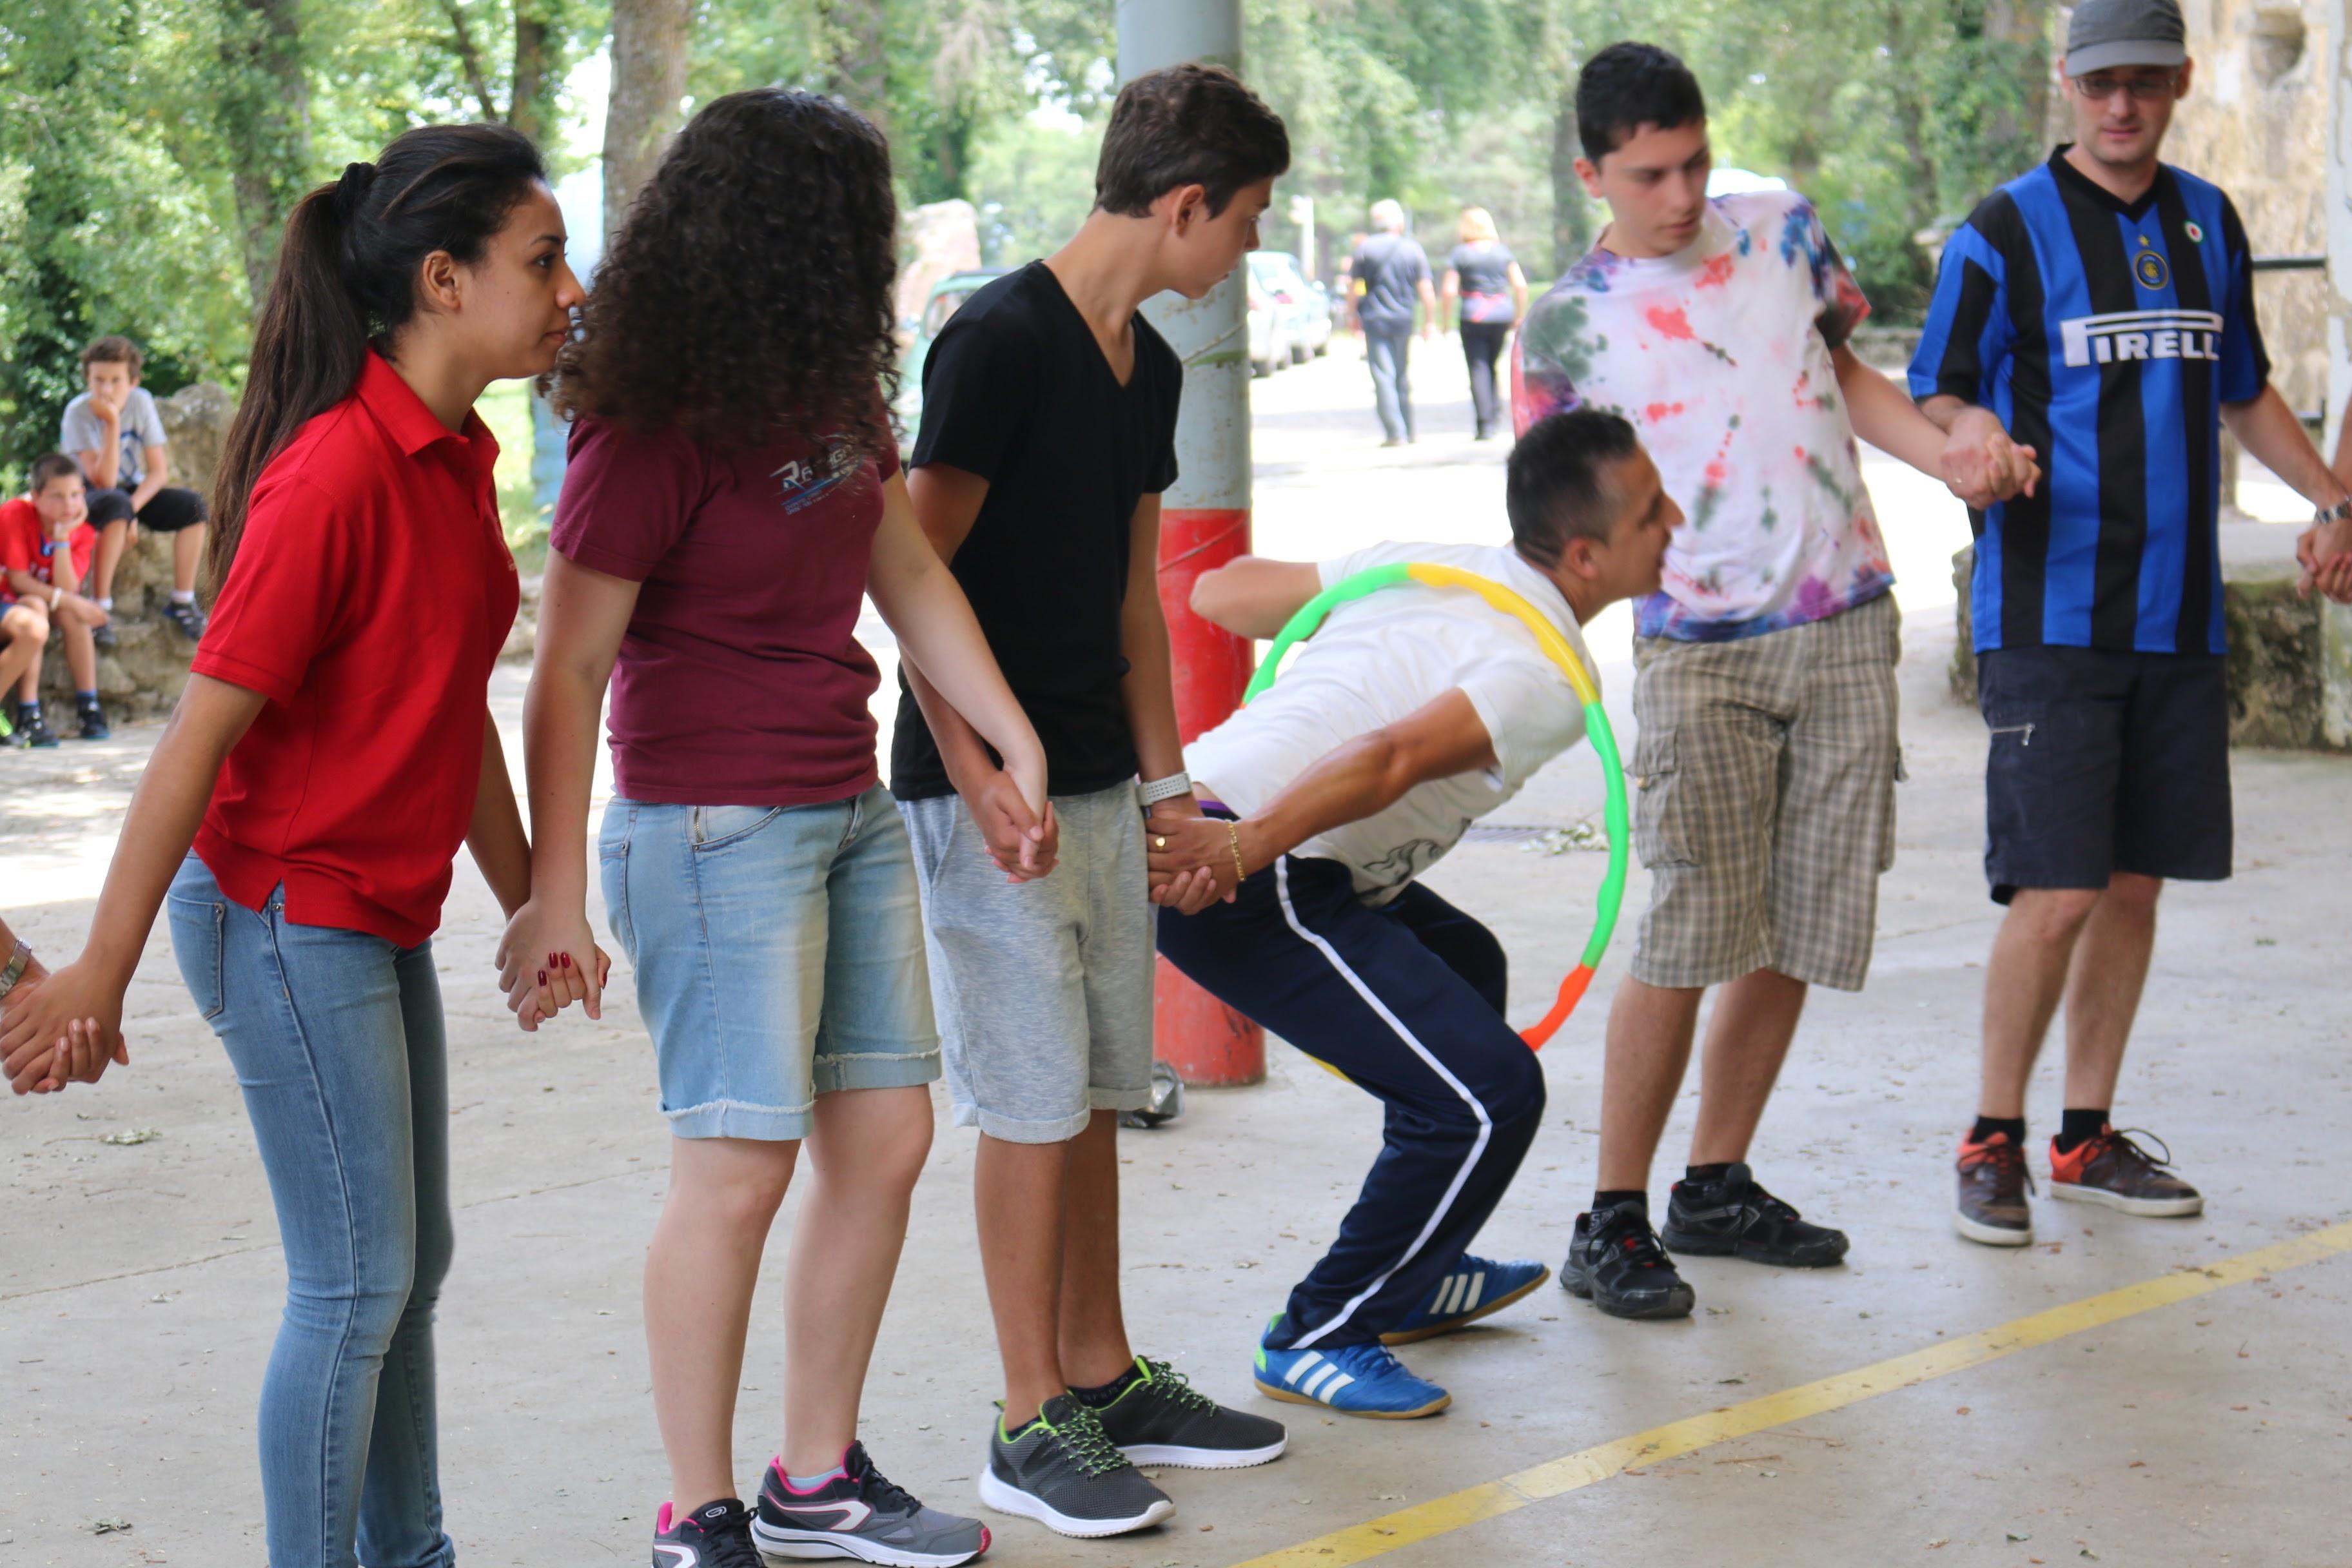 Picasa - Día de Campo SdJ 05.07.2015 (39).jpg